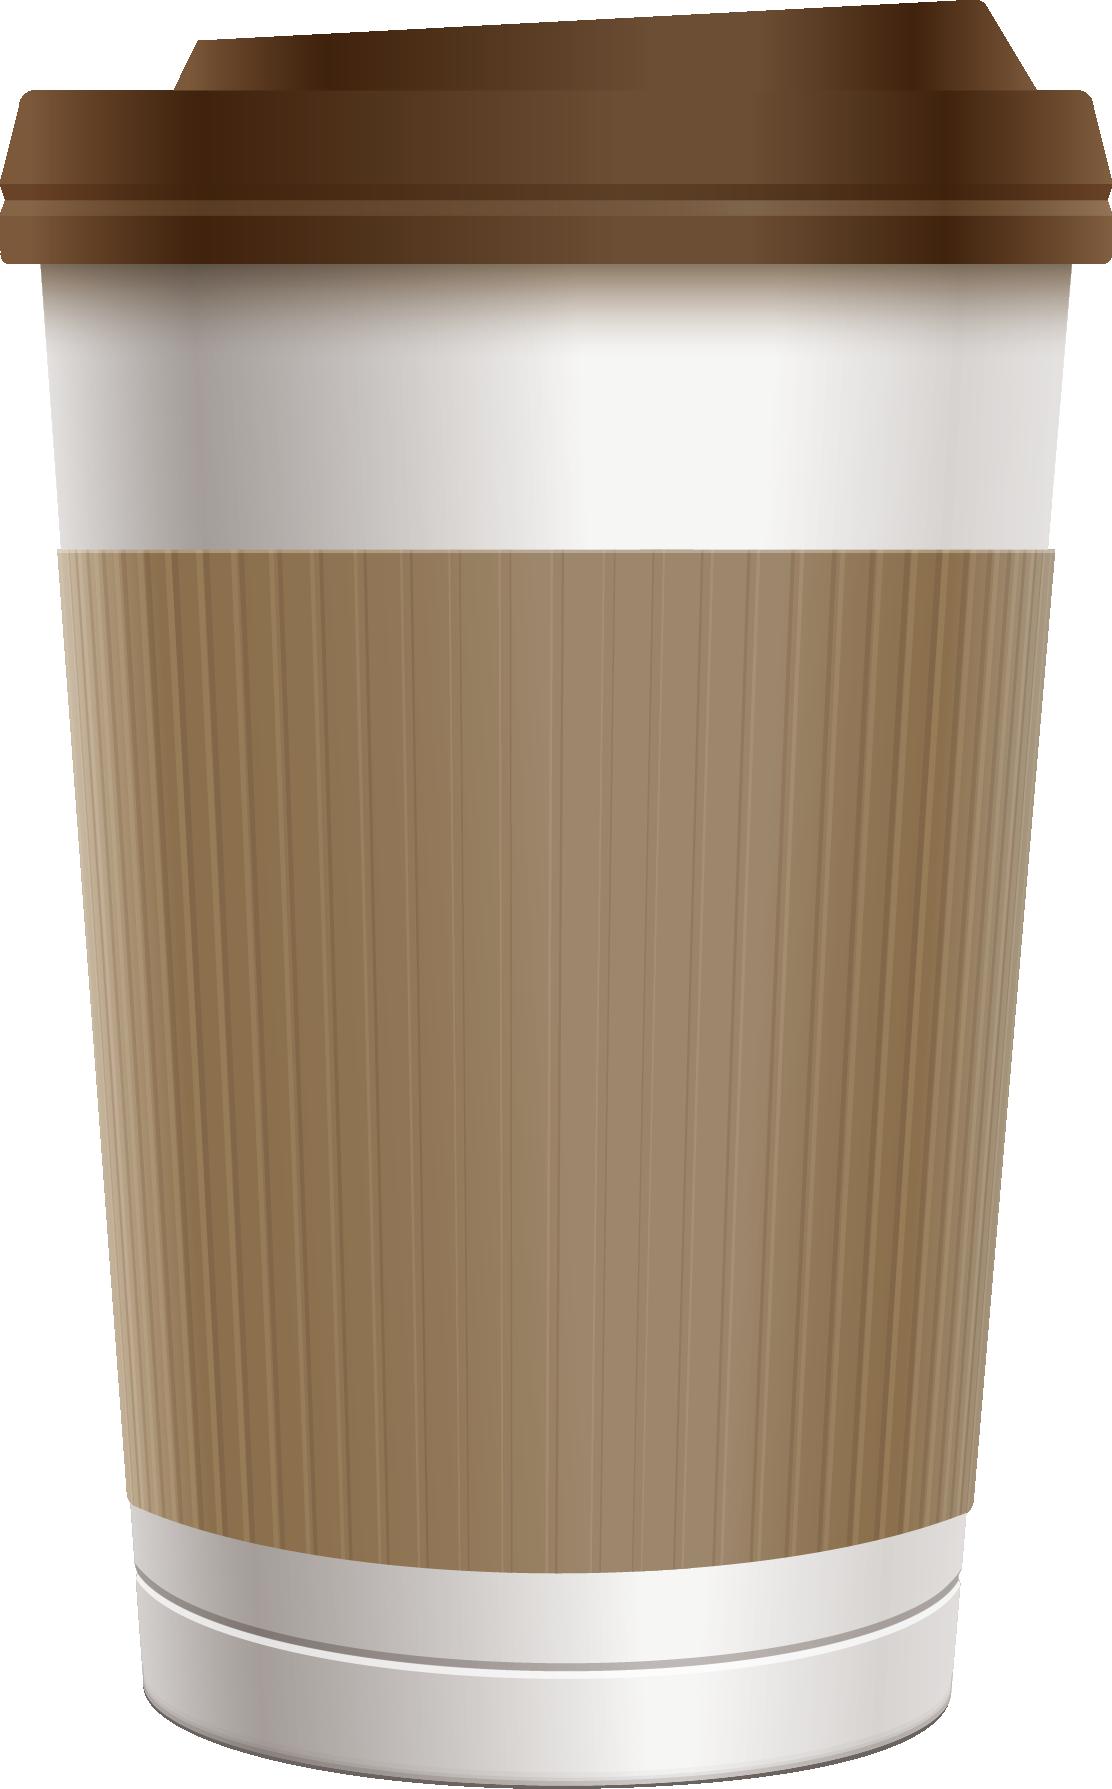 Clipart cup tumbler. Adobe illustrator paper clip